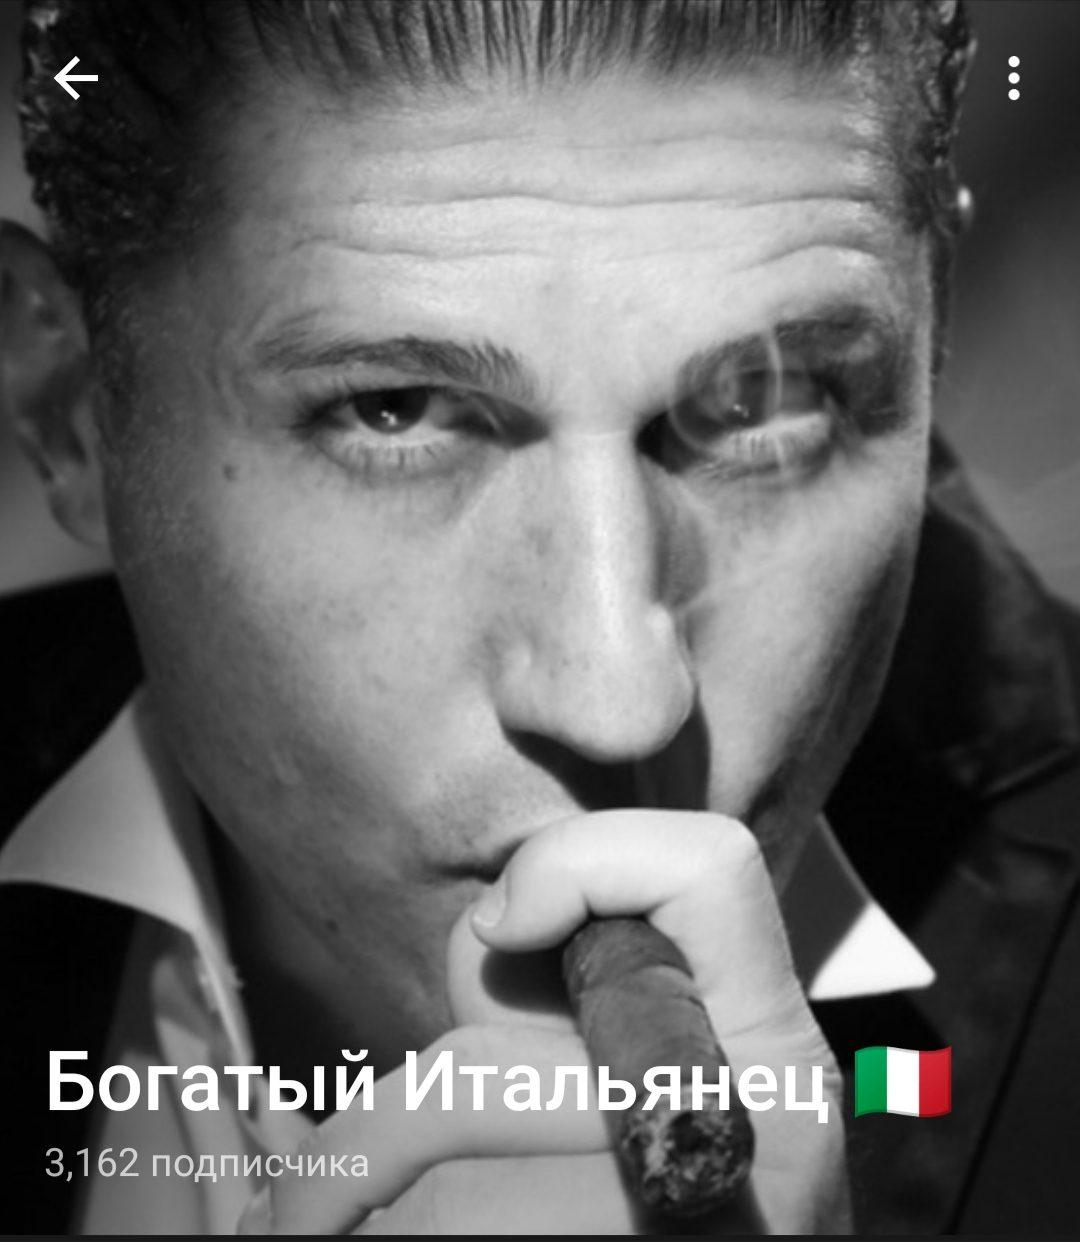 Богатый Итальянец